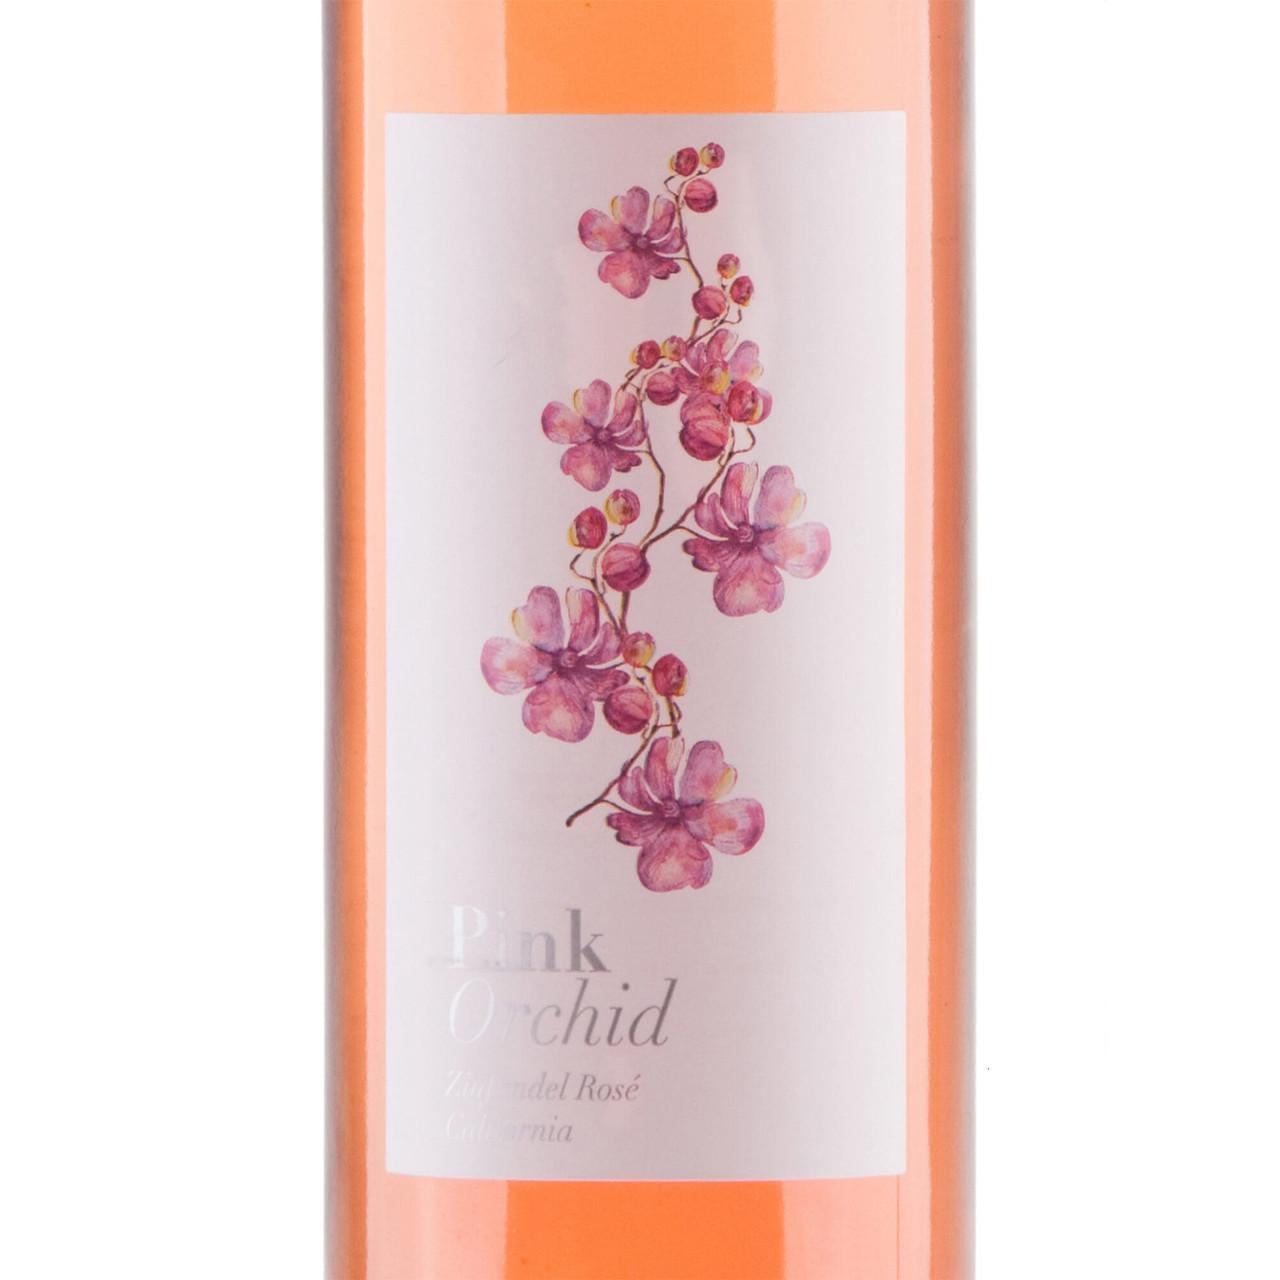 Pink Orchid California Zinfandel Rose Wine 75cl